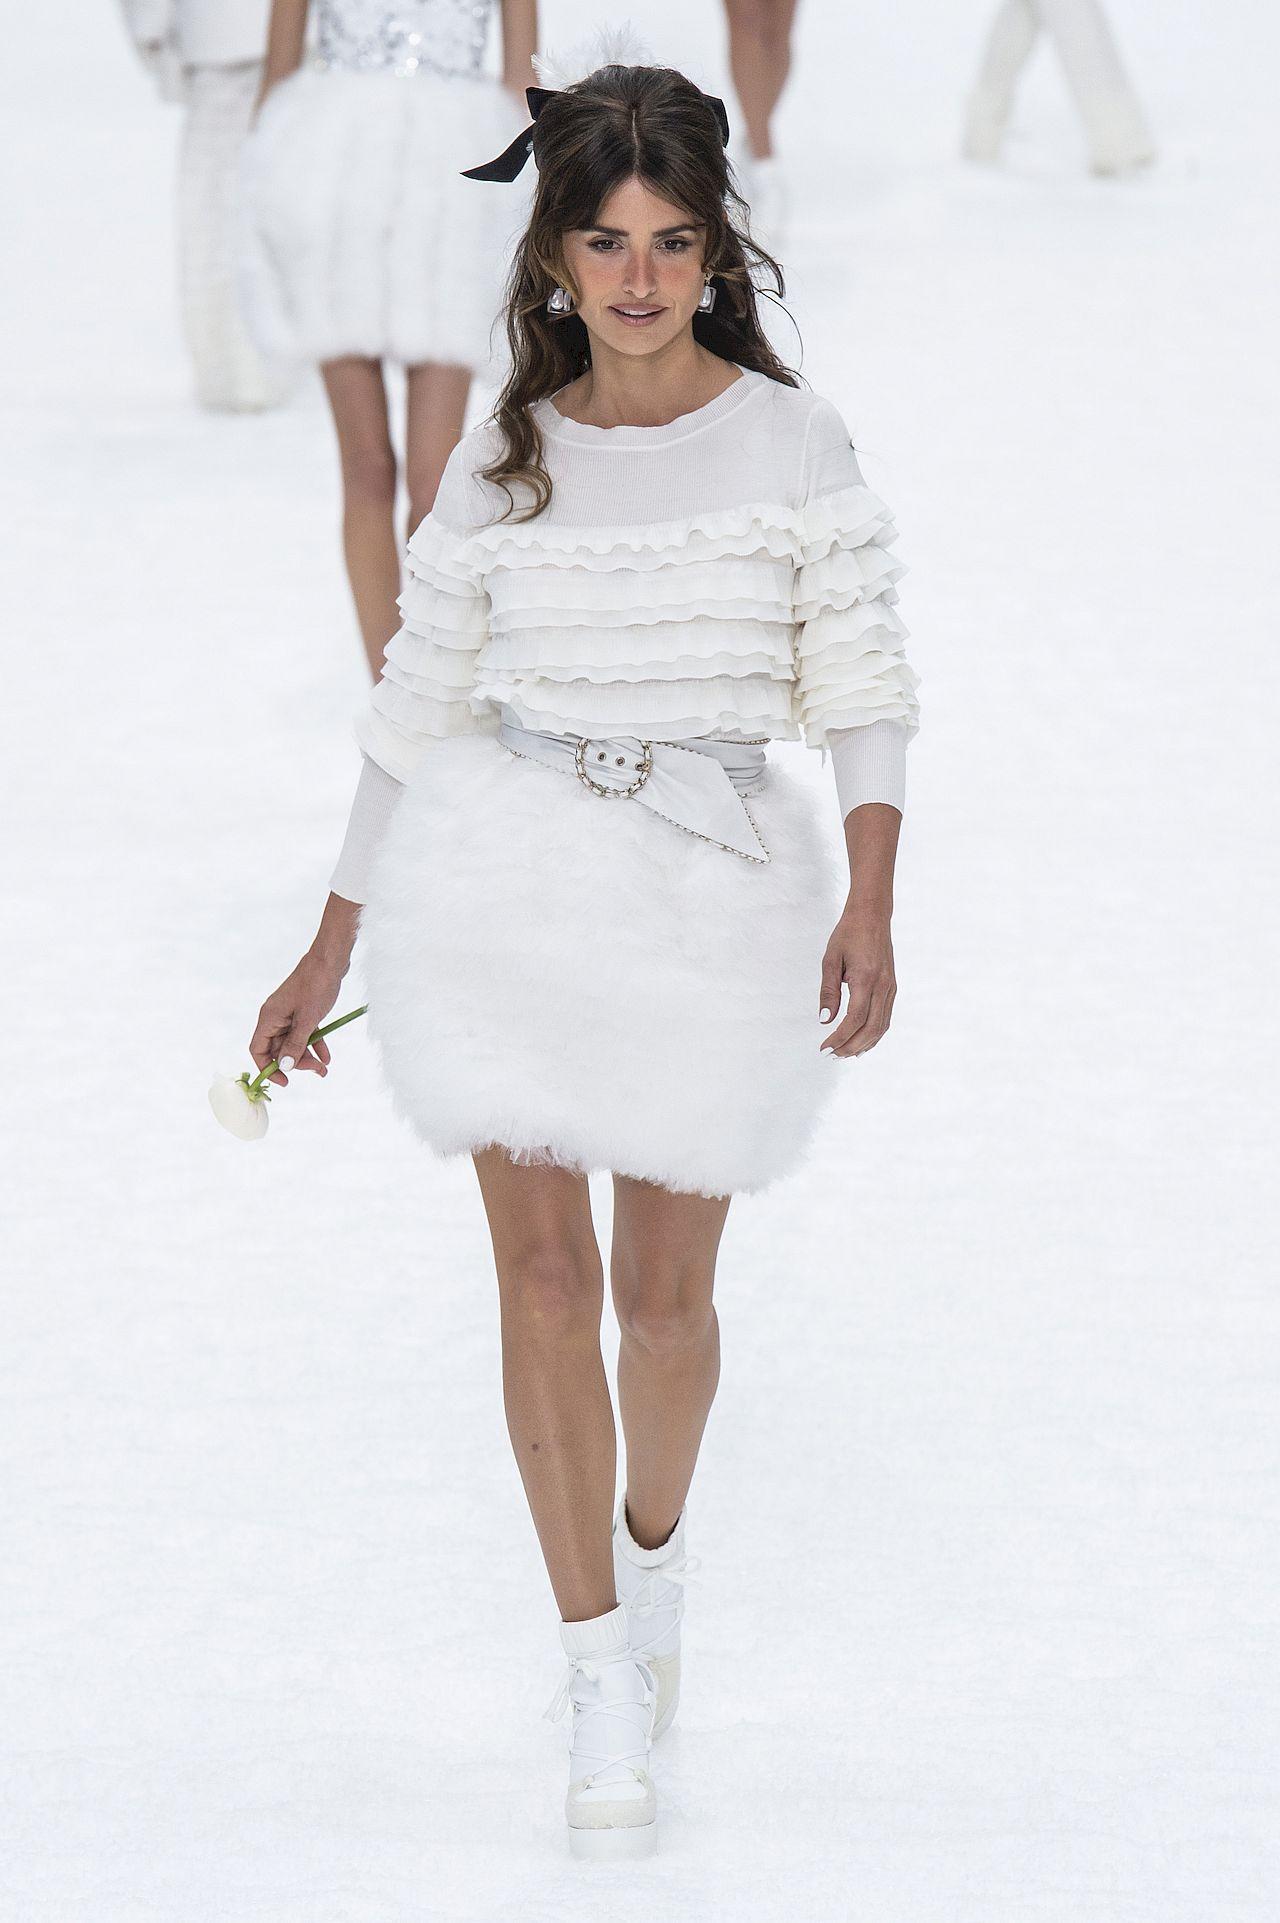 Chanel show at Paris Fashion Week Autumn Winter 2019